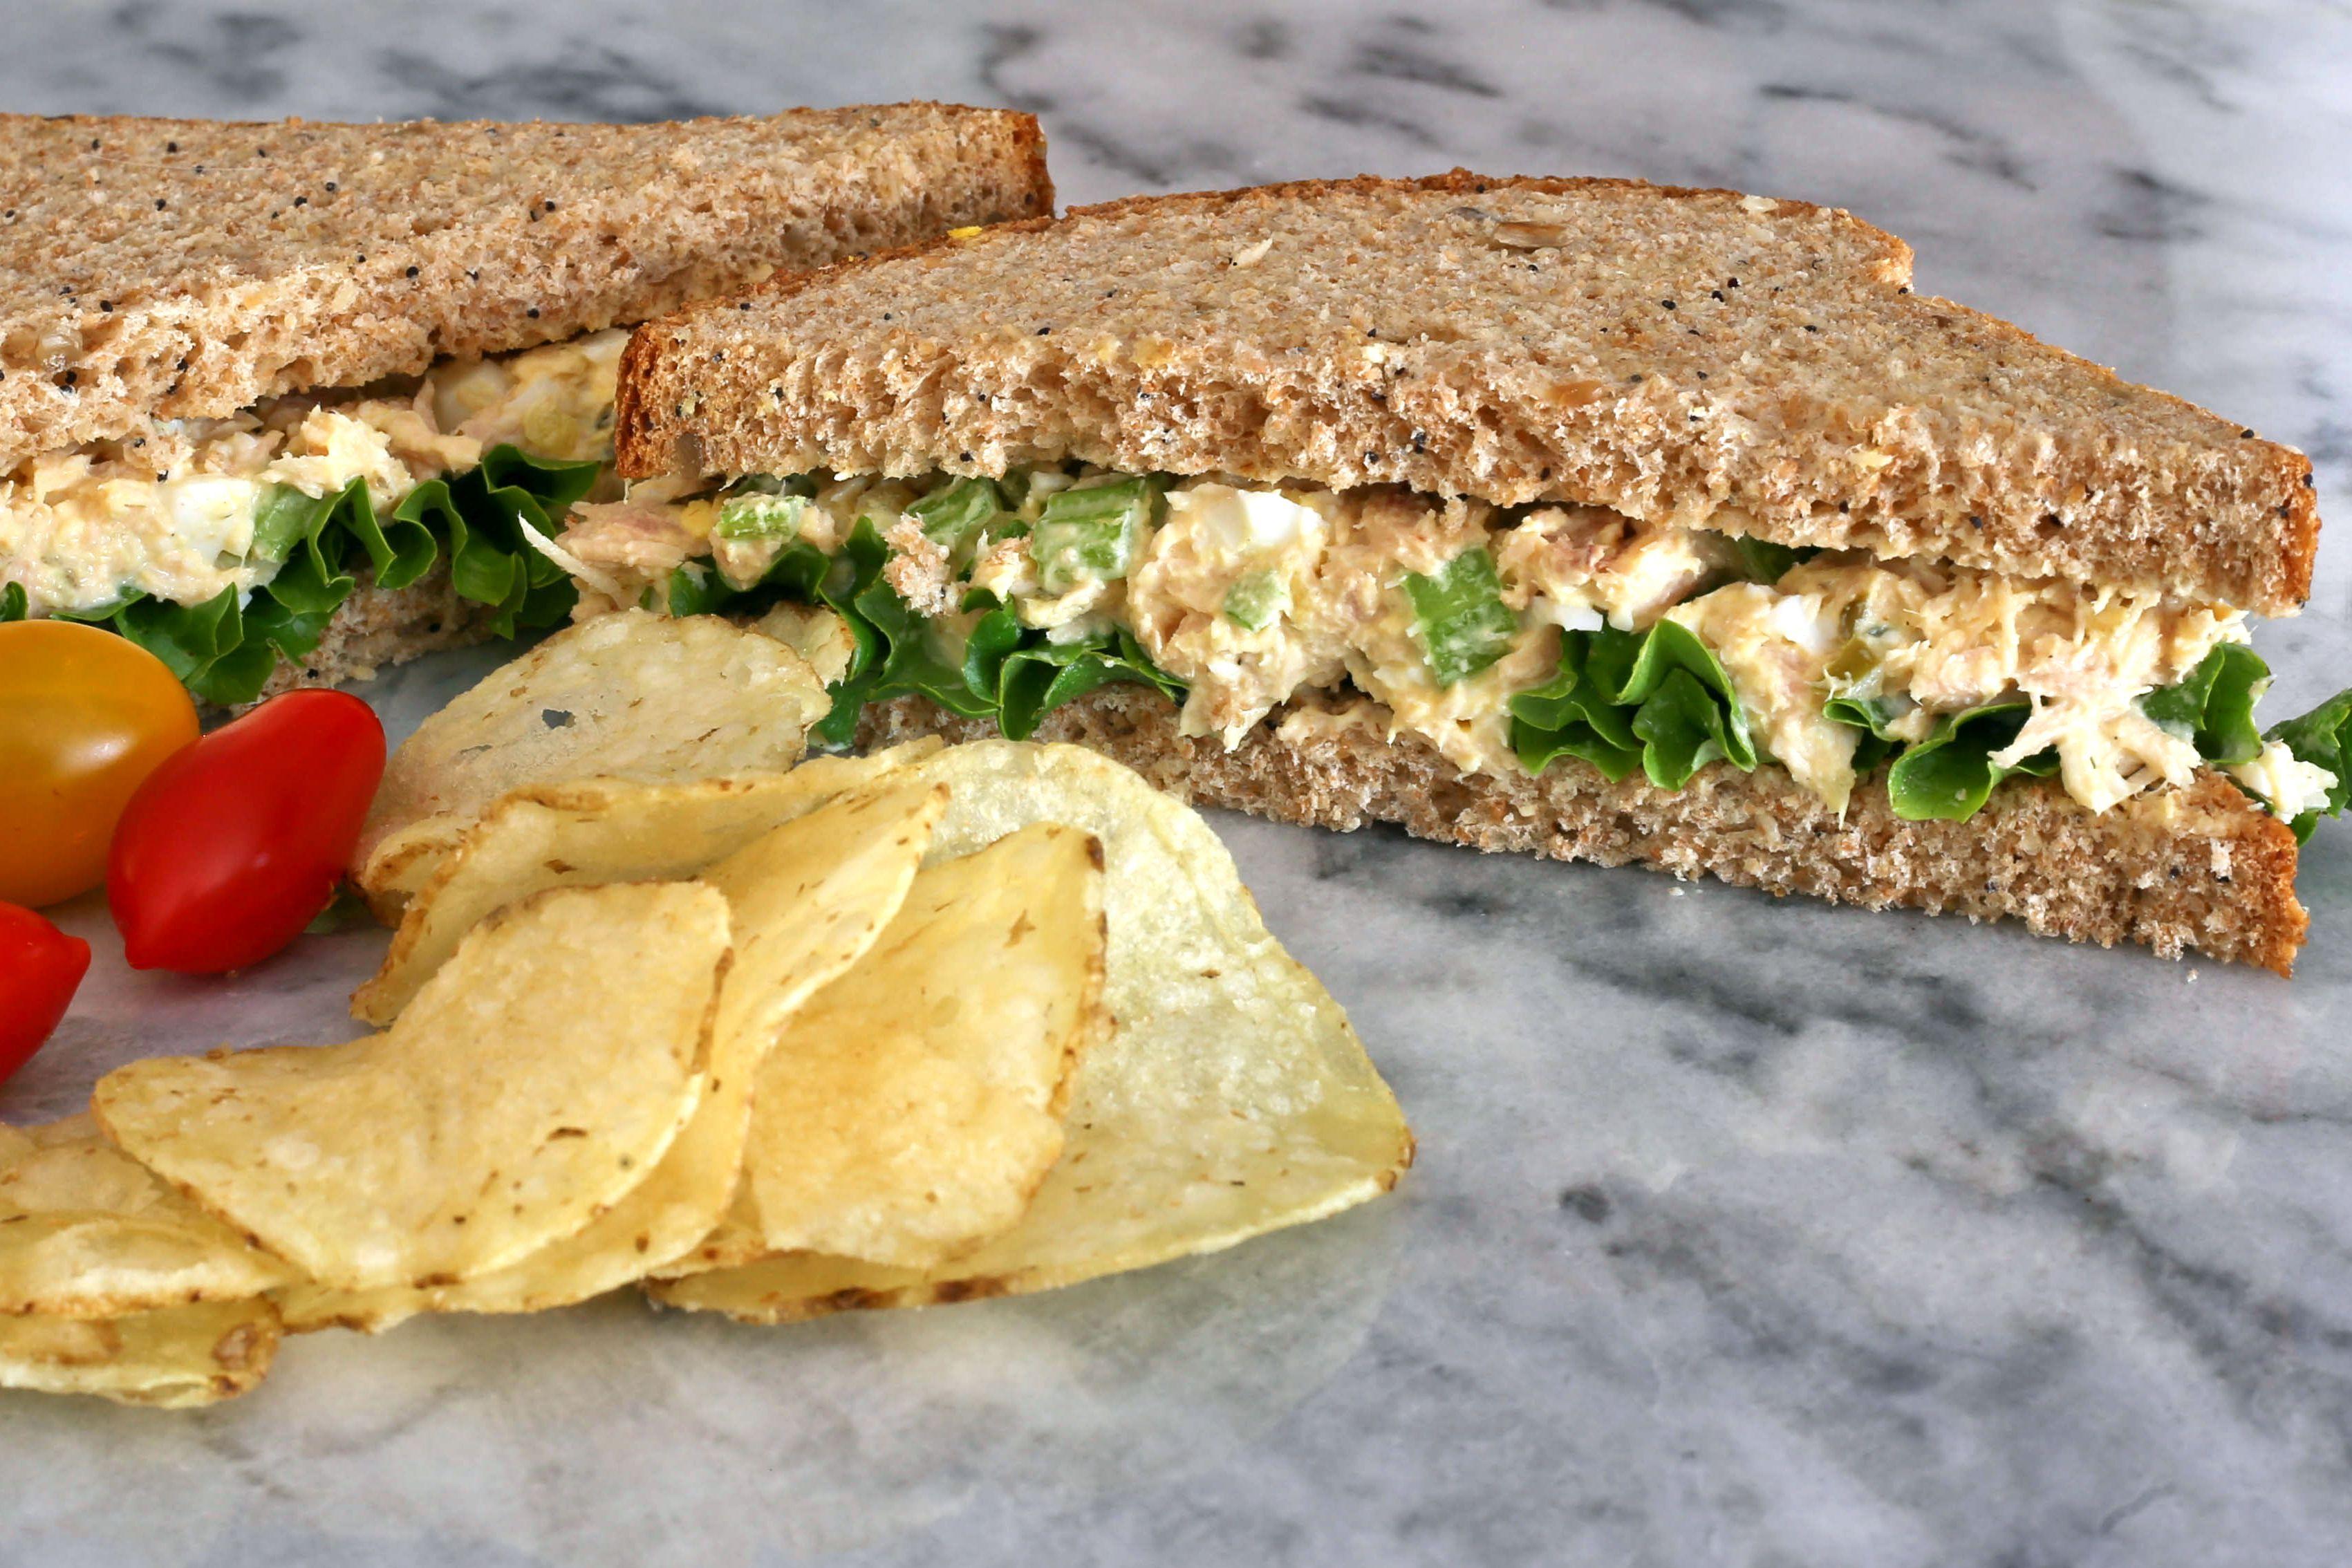 tuna sandwich and chips